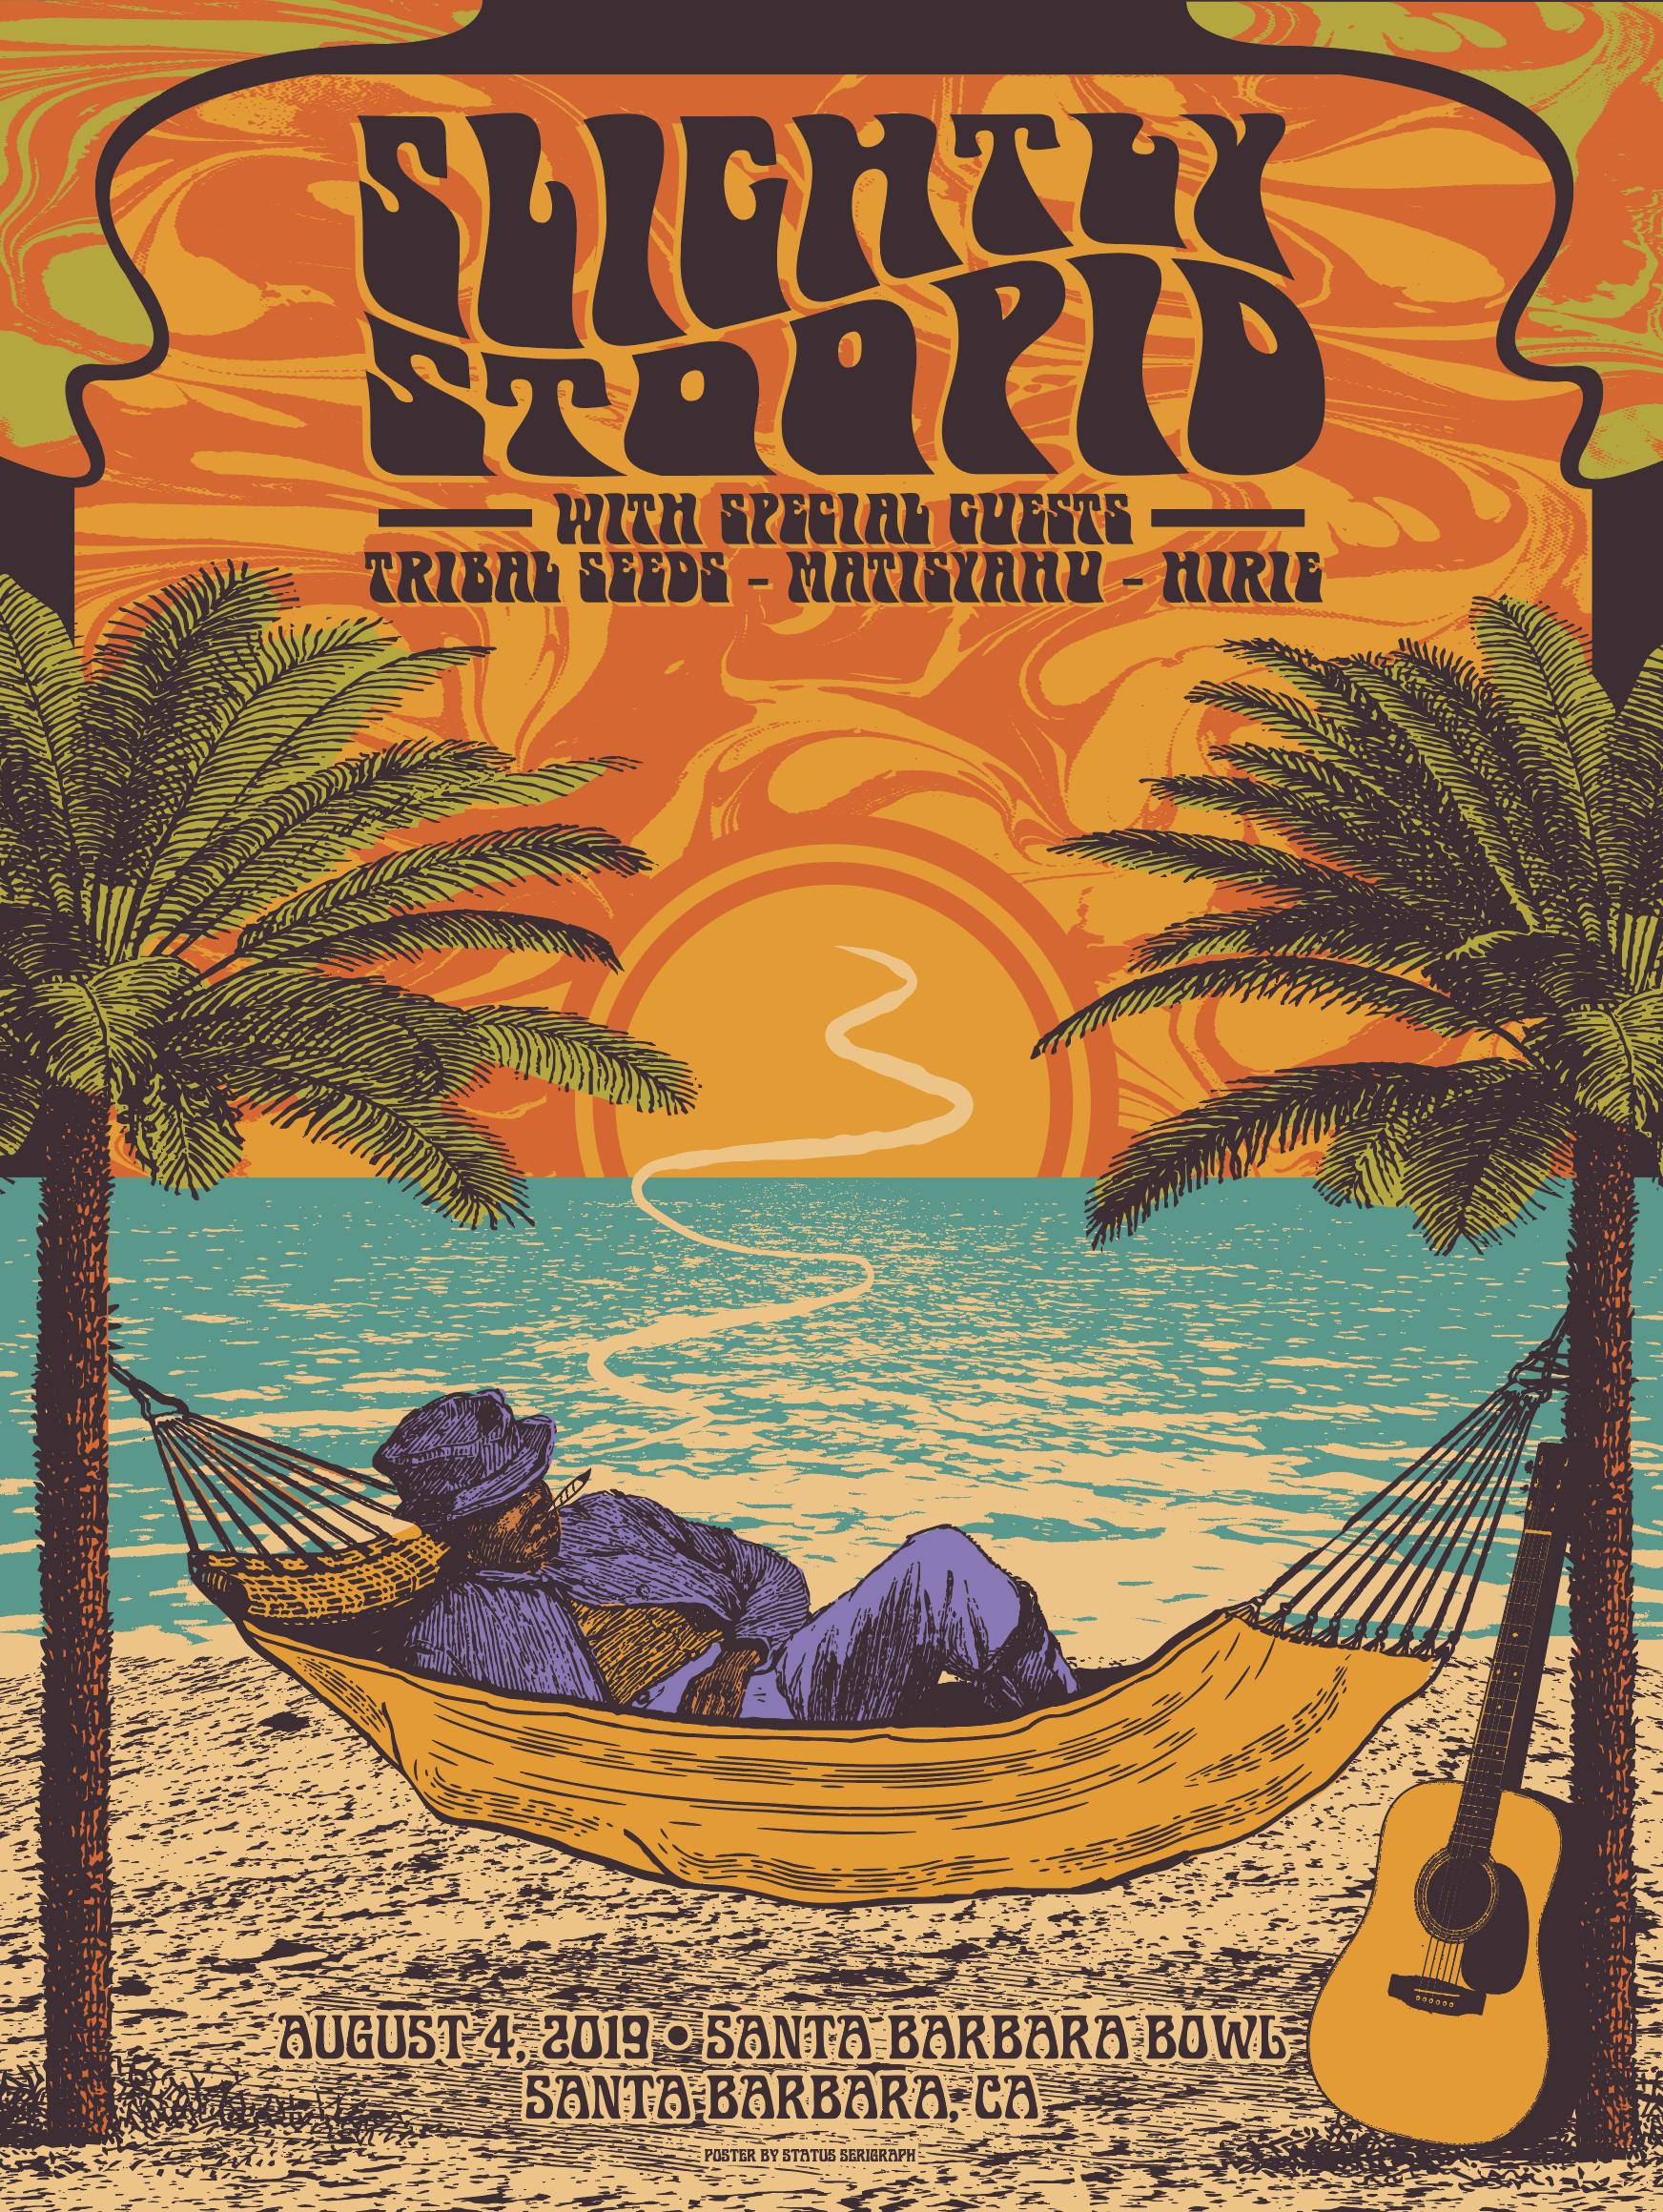 08.04 - Santa Barbara CA Poster (1) (1).png